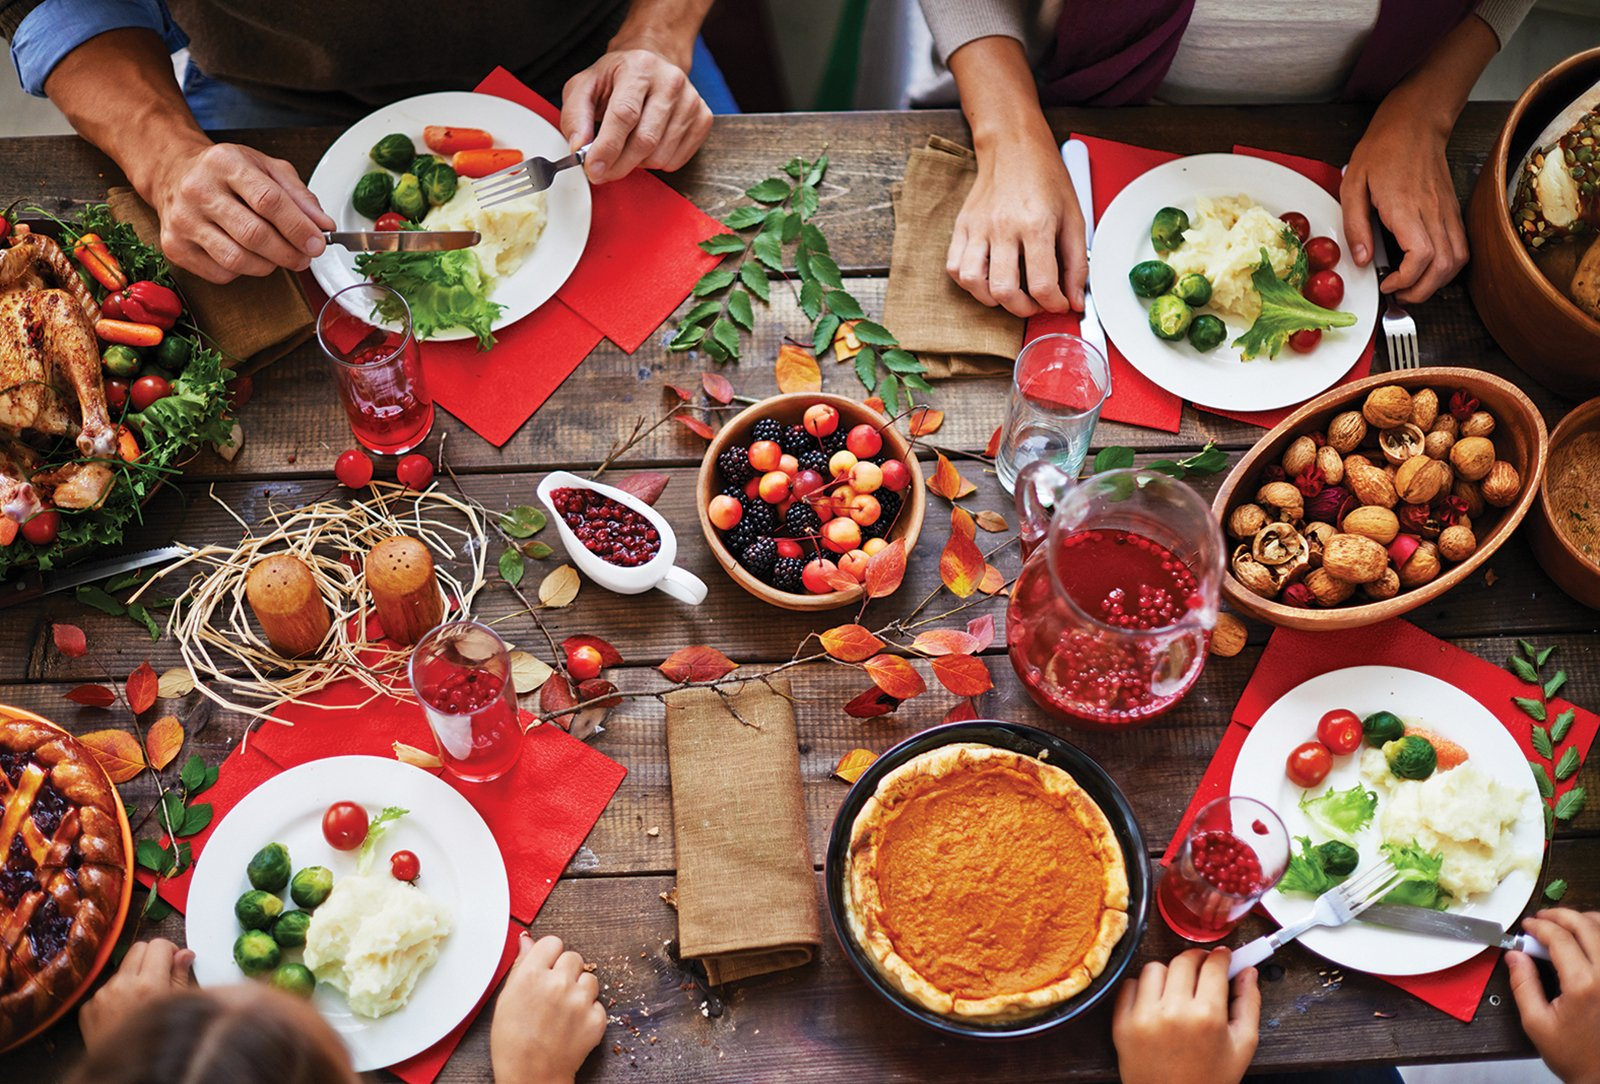 highlands-nc-ifc-thanksgiving-dinner